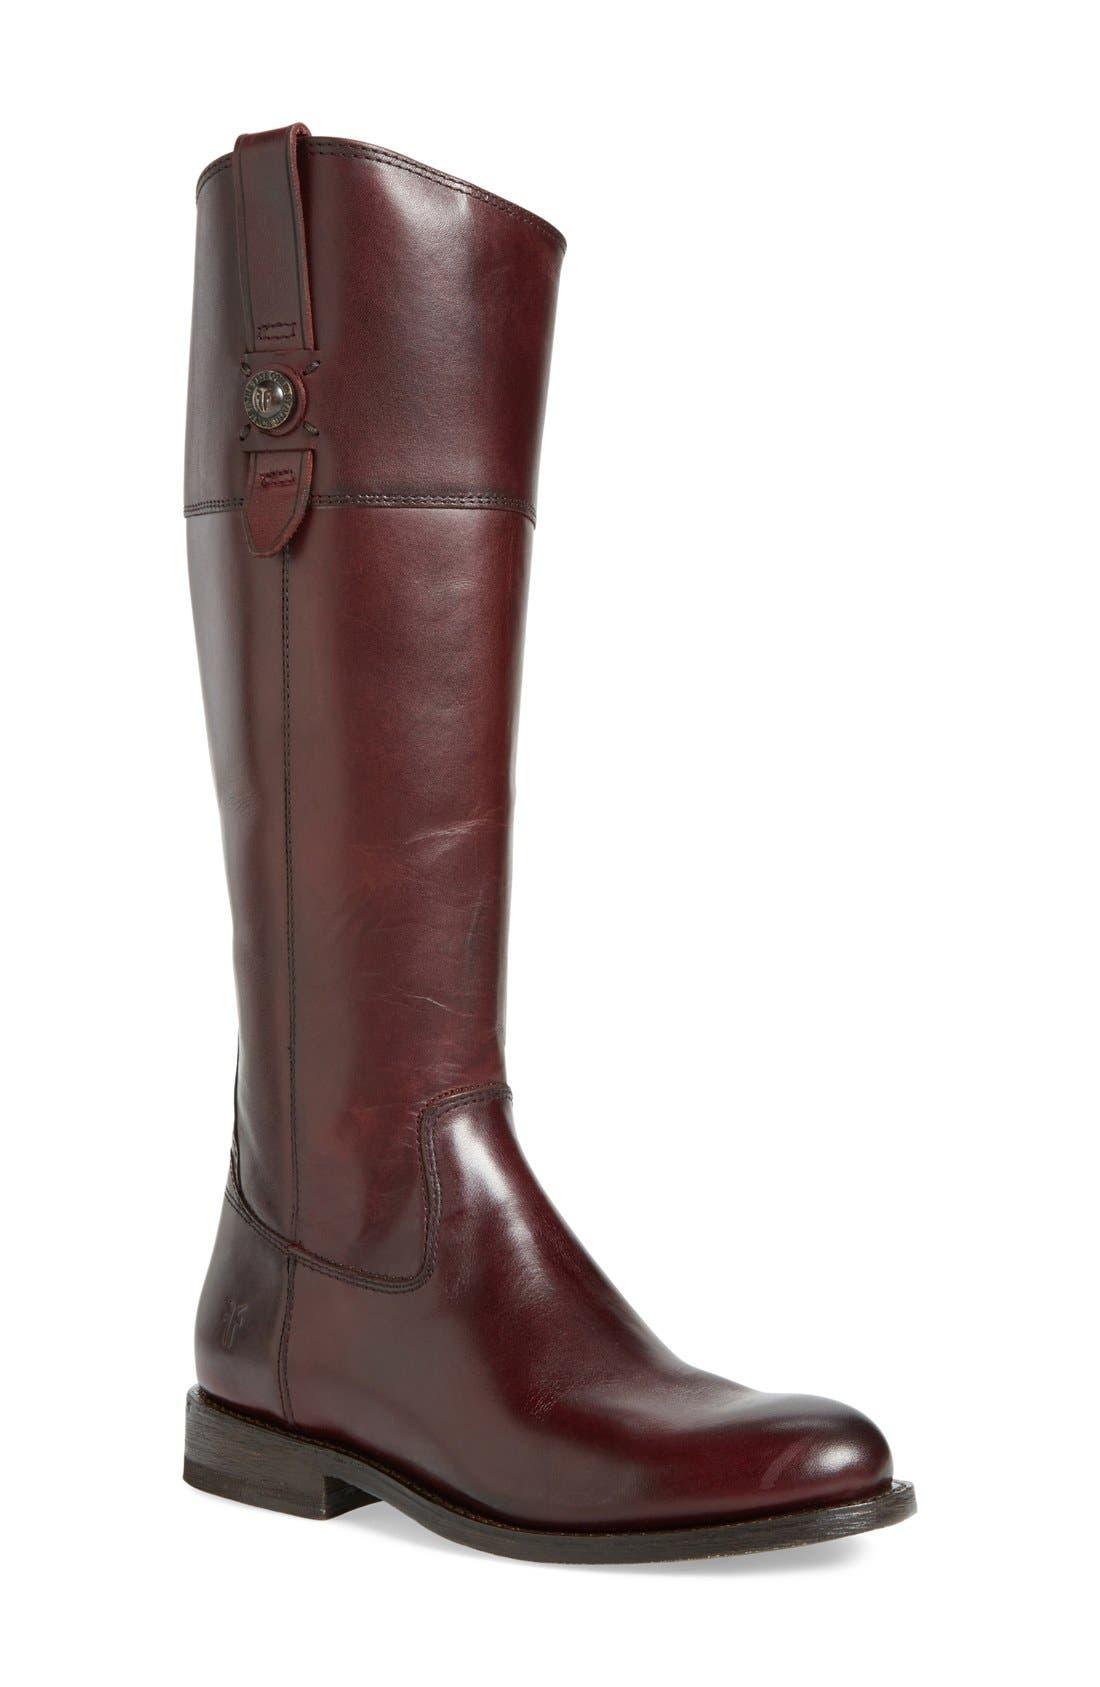 Alternate Image 1 Selected - Frye'JaydenButton' Tall Boot (Women)